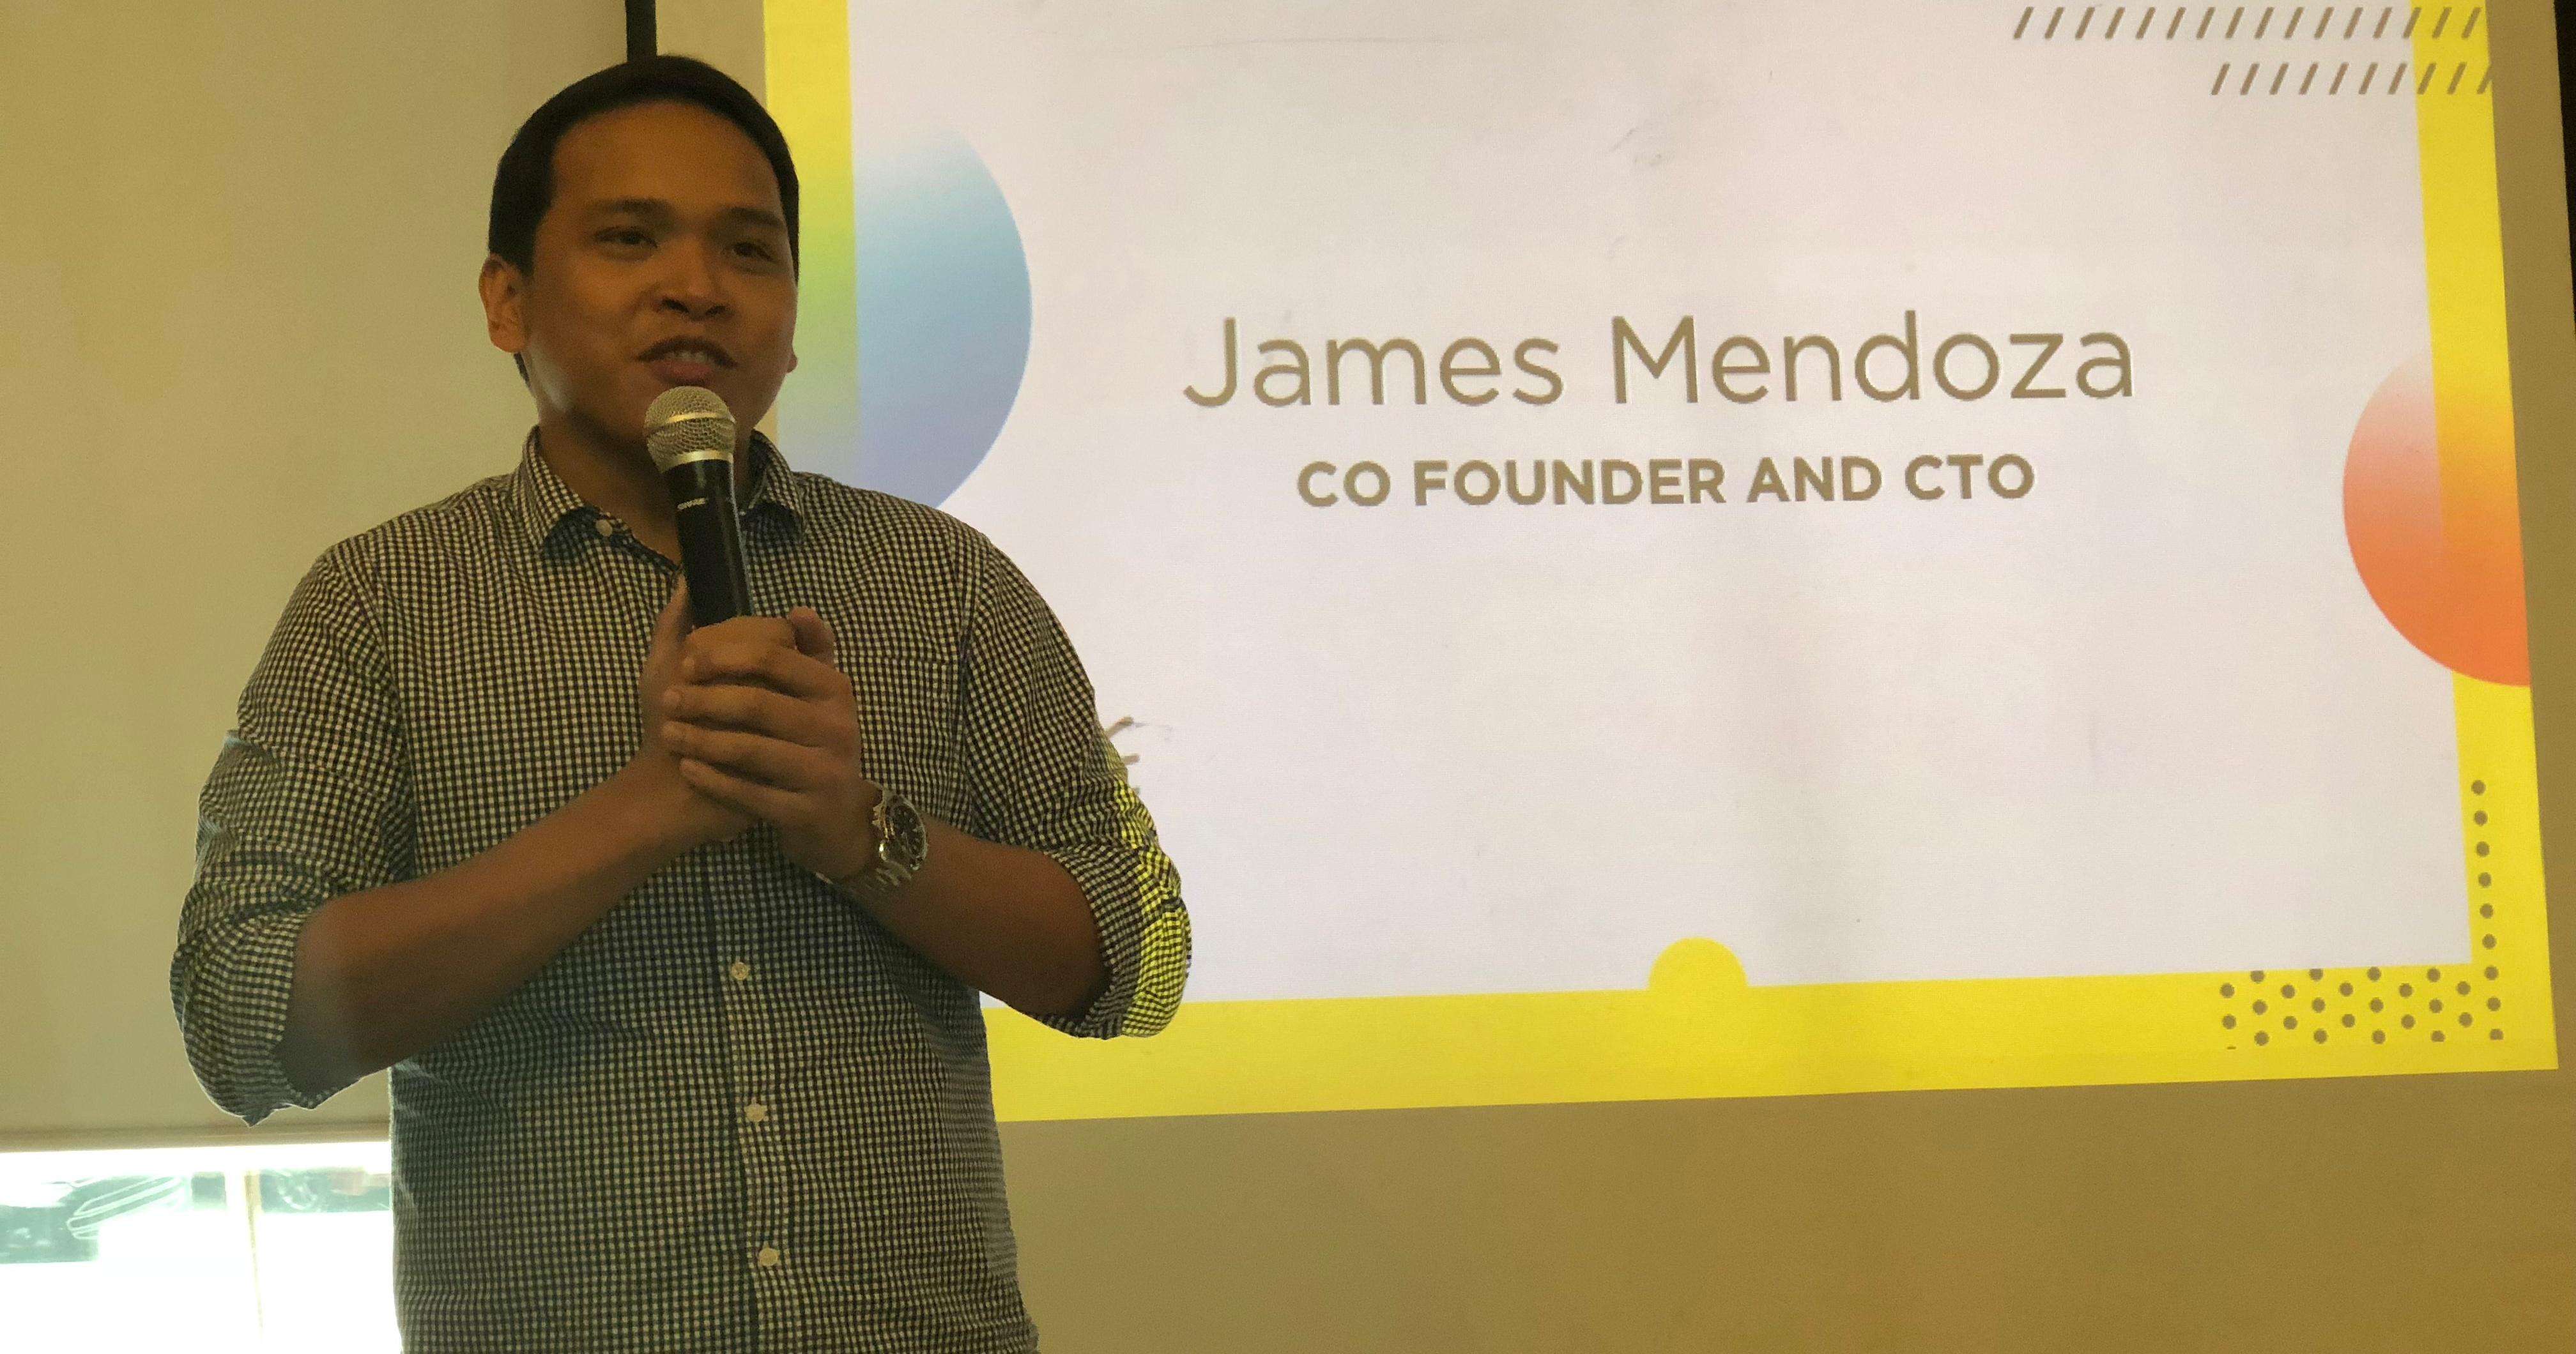 james_mendoza-co-founder_and_cto_-_563.jpg